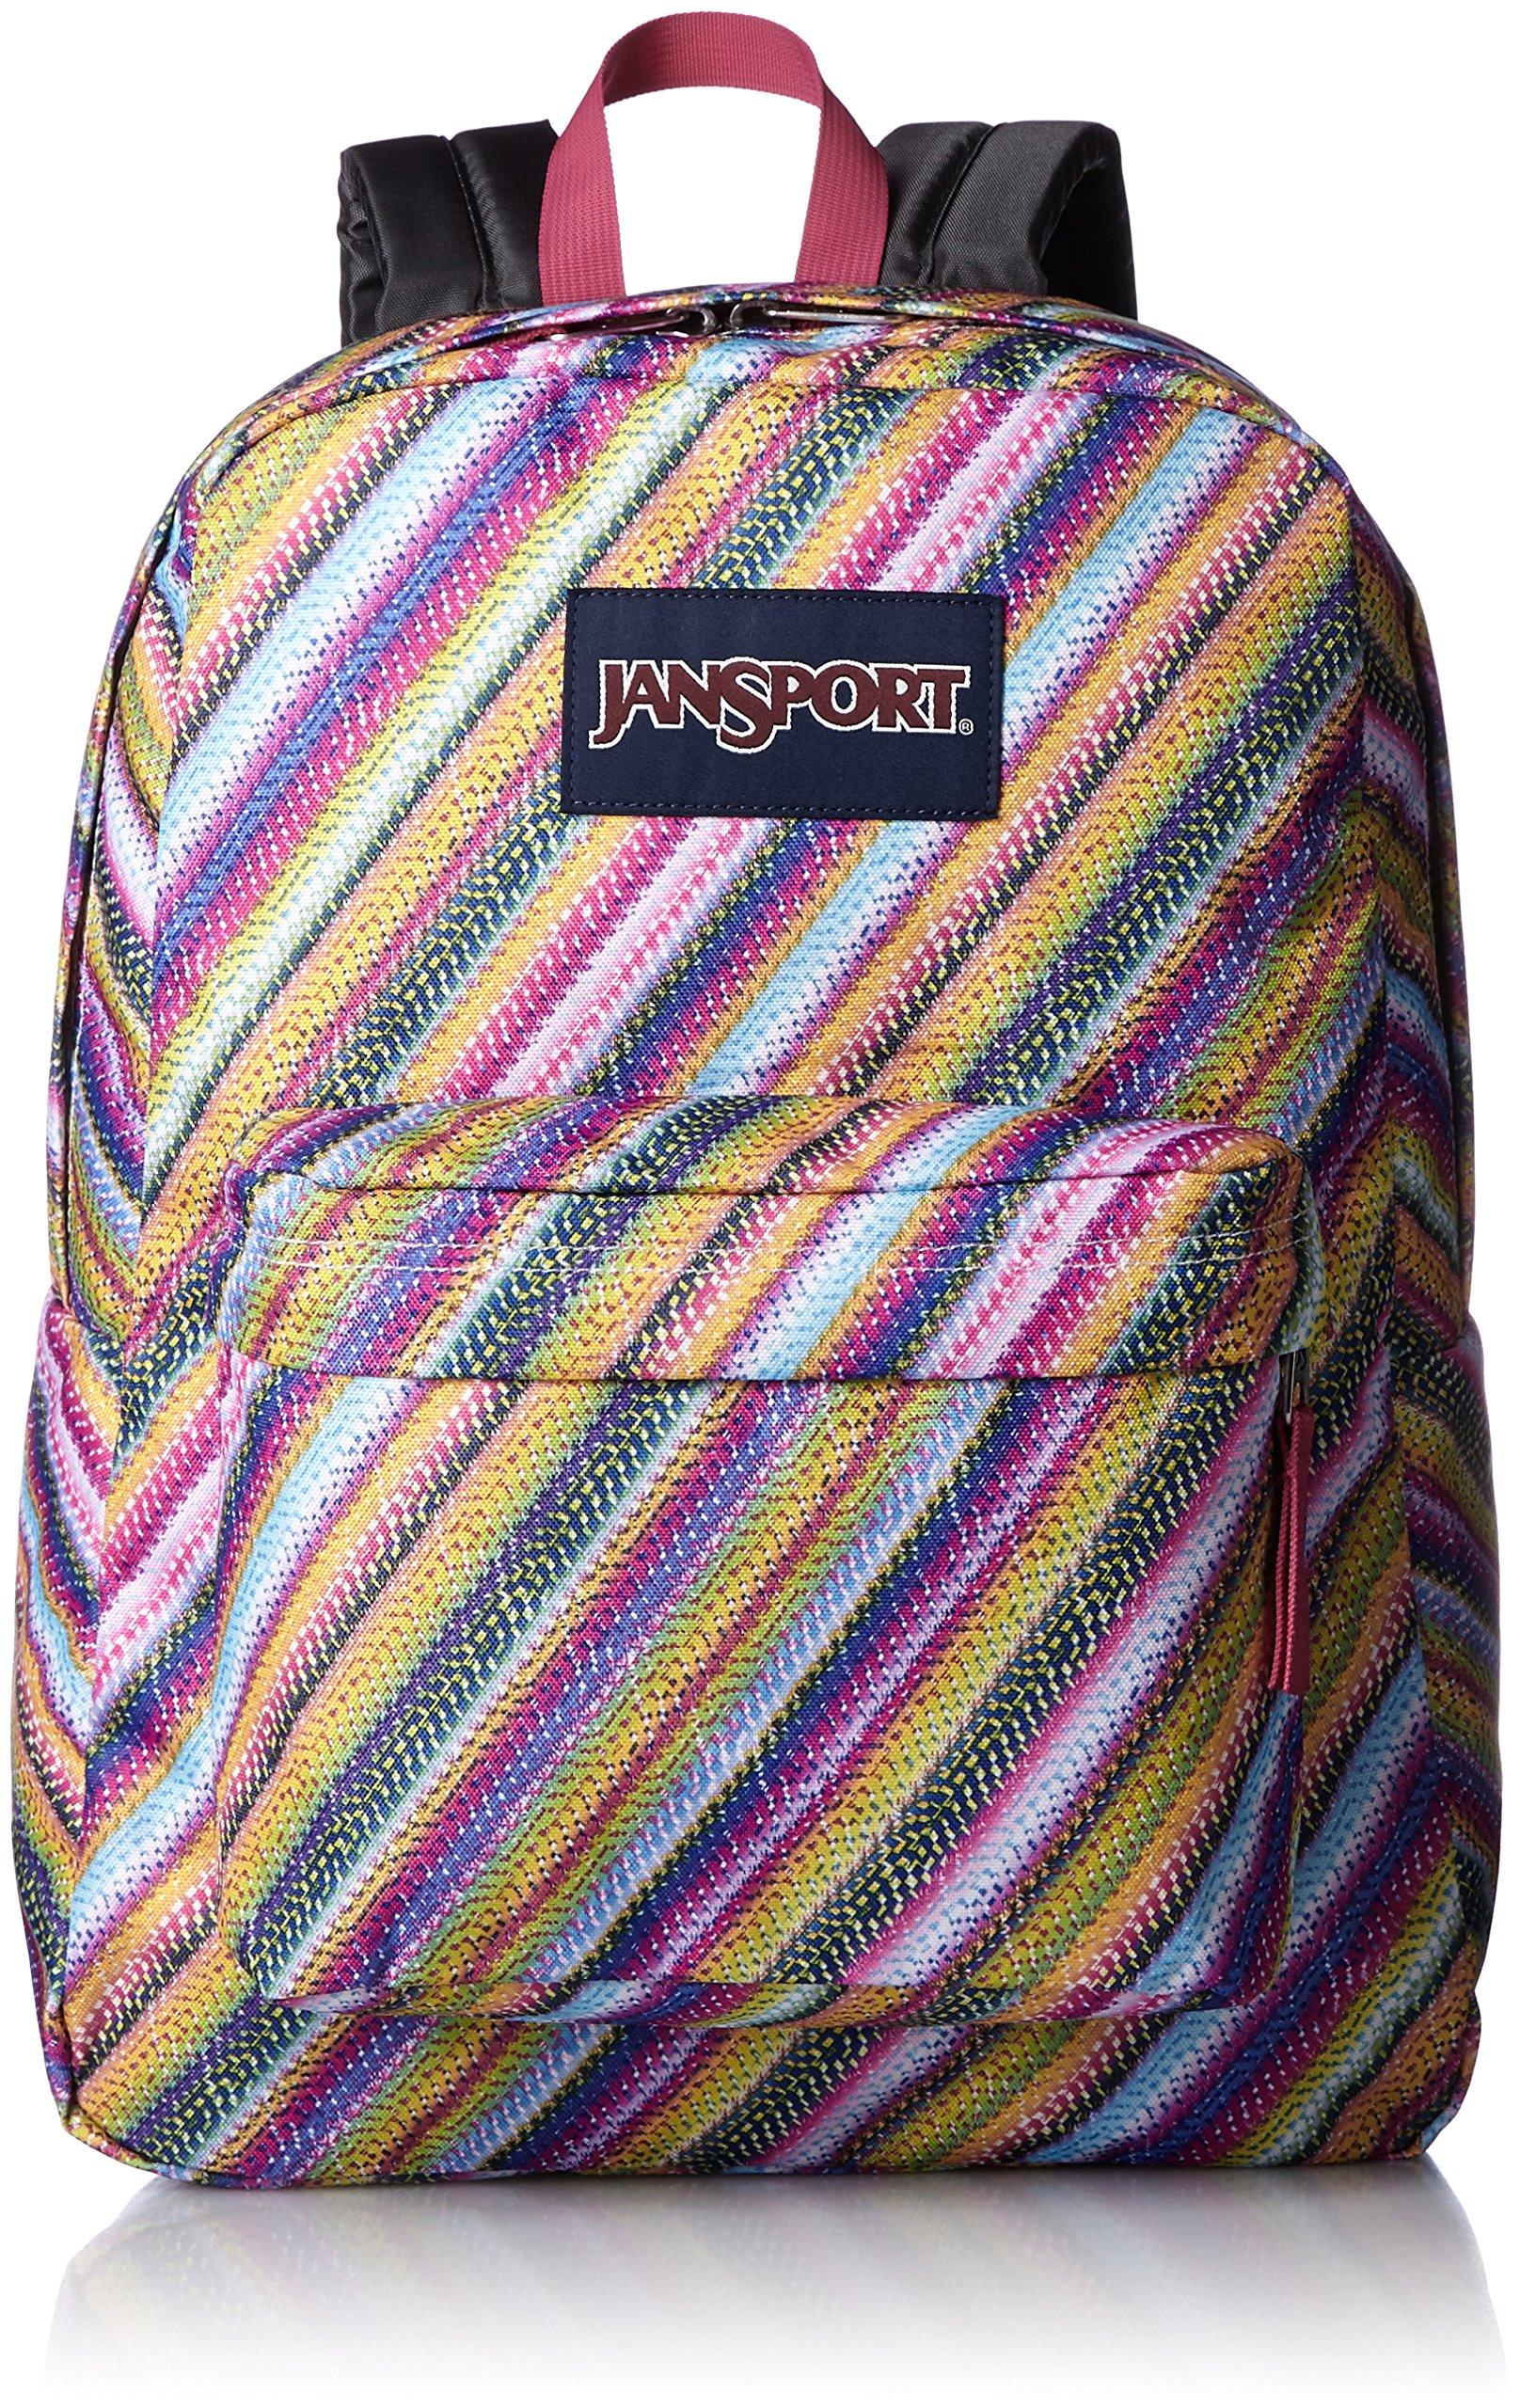 JanSport Superbreak Backpack- Sale Colors (Multi Texture Stripe)